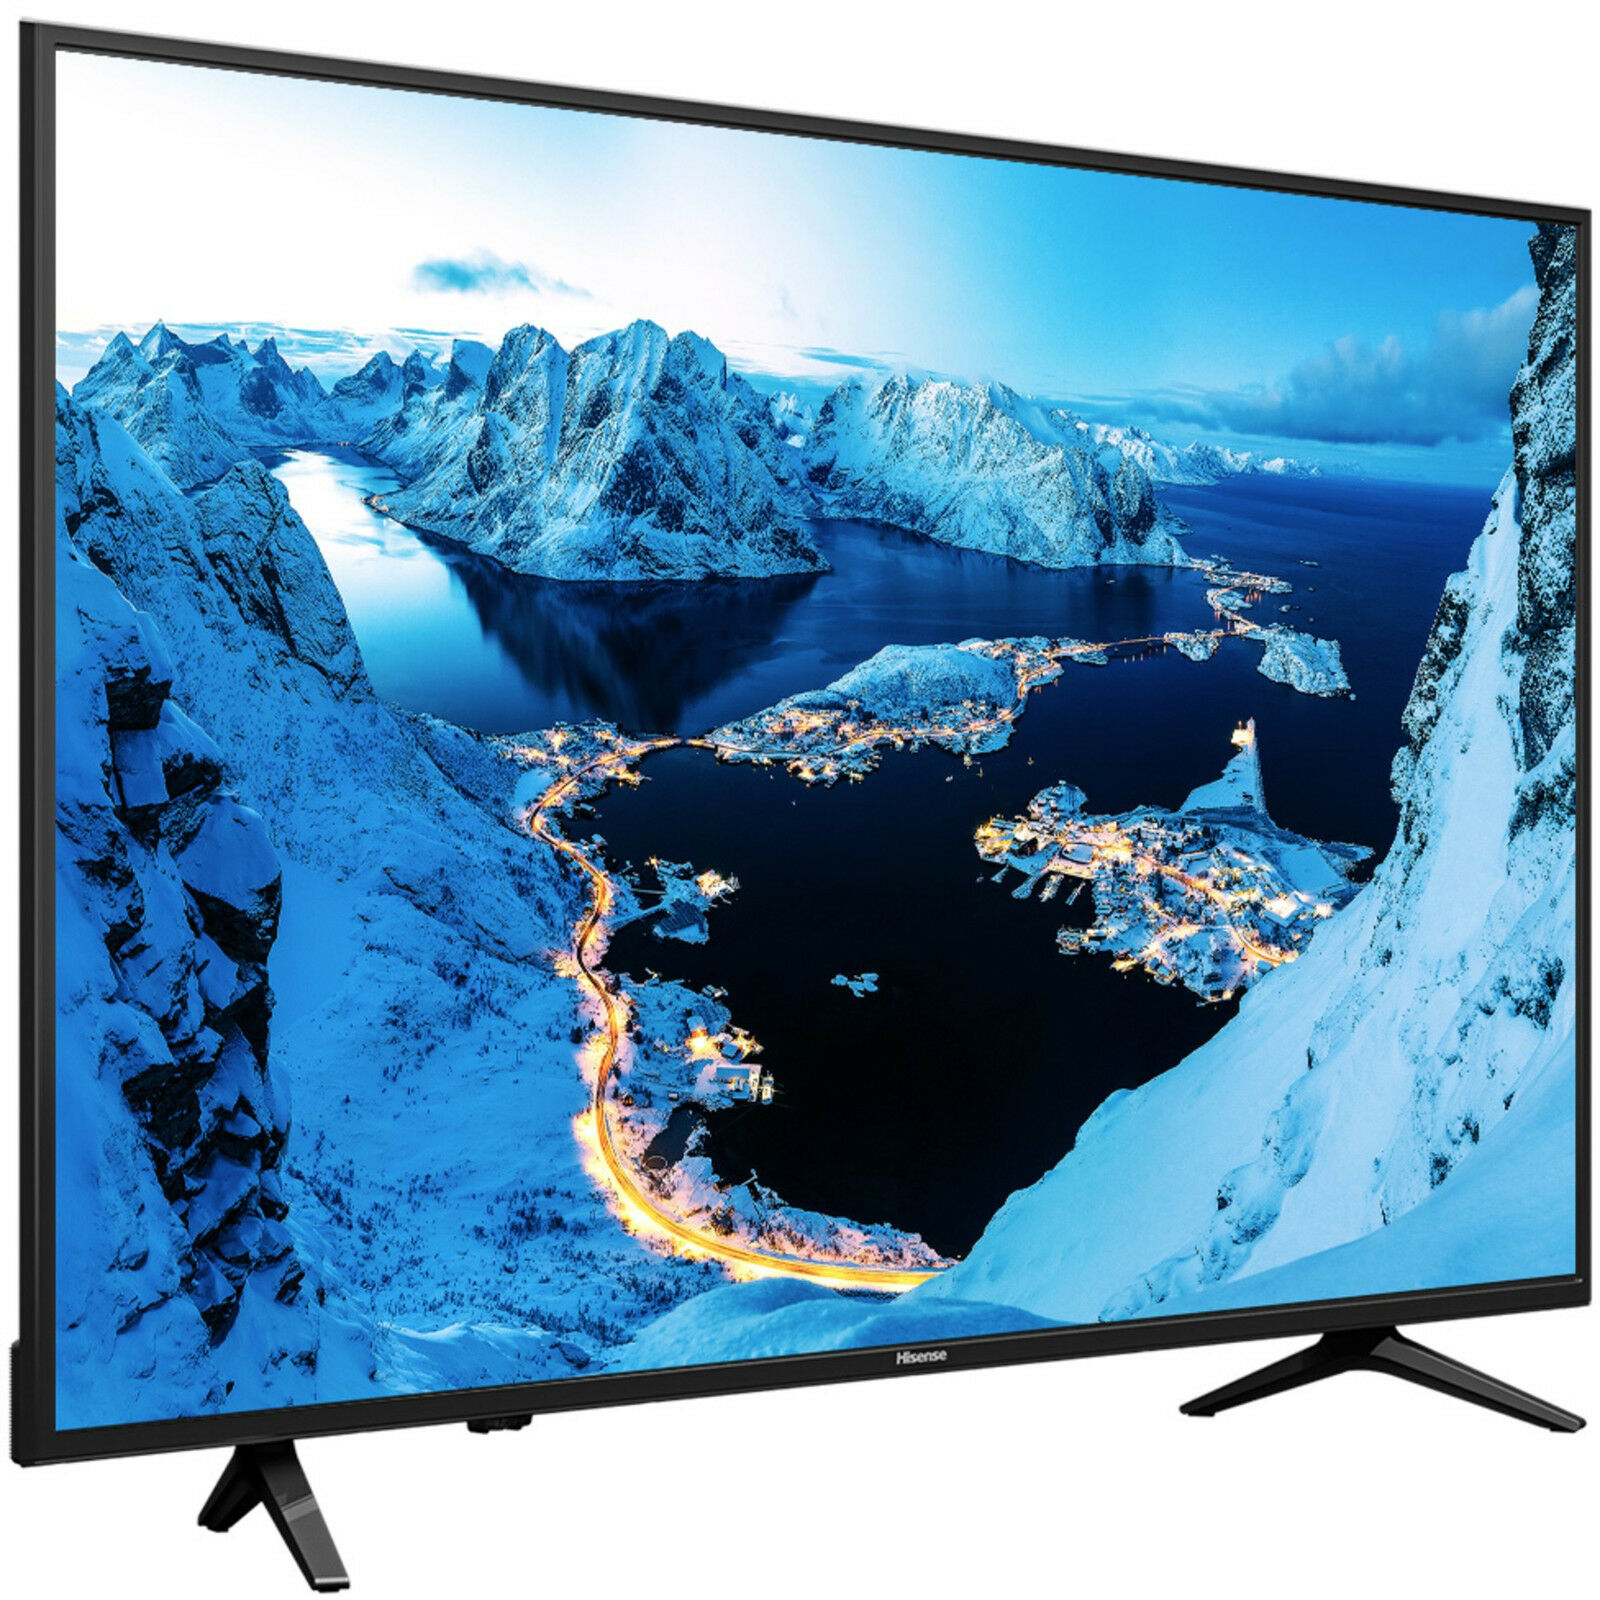 50 Zoll Fernseher Test Vergleich +++ 50 Zoll Fernseher